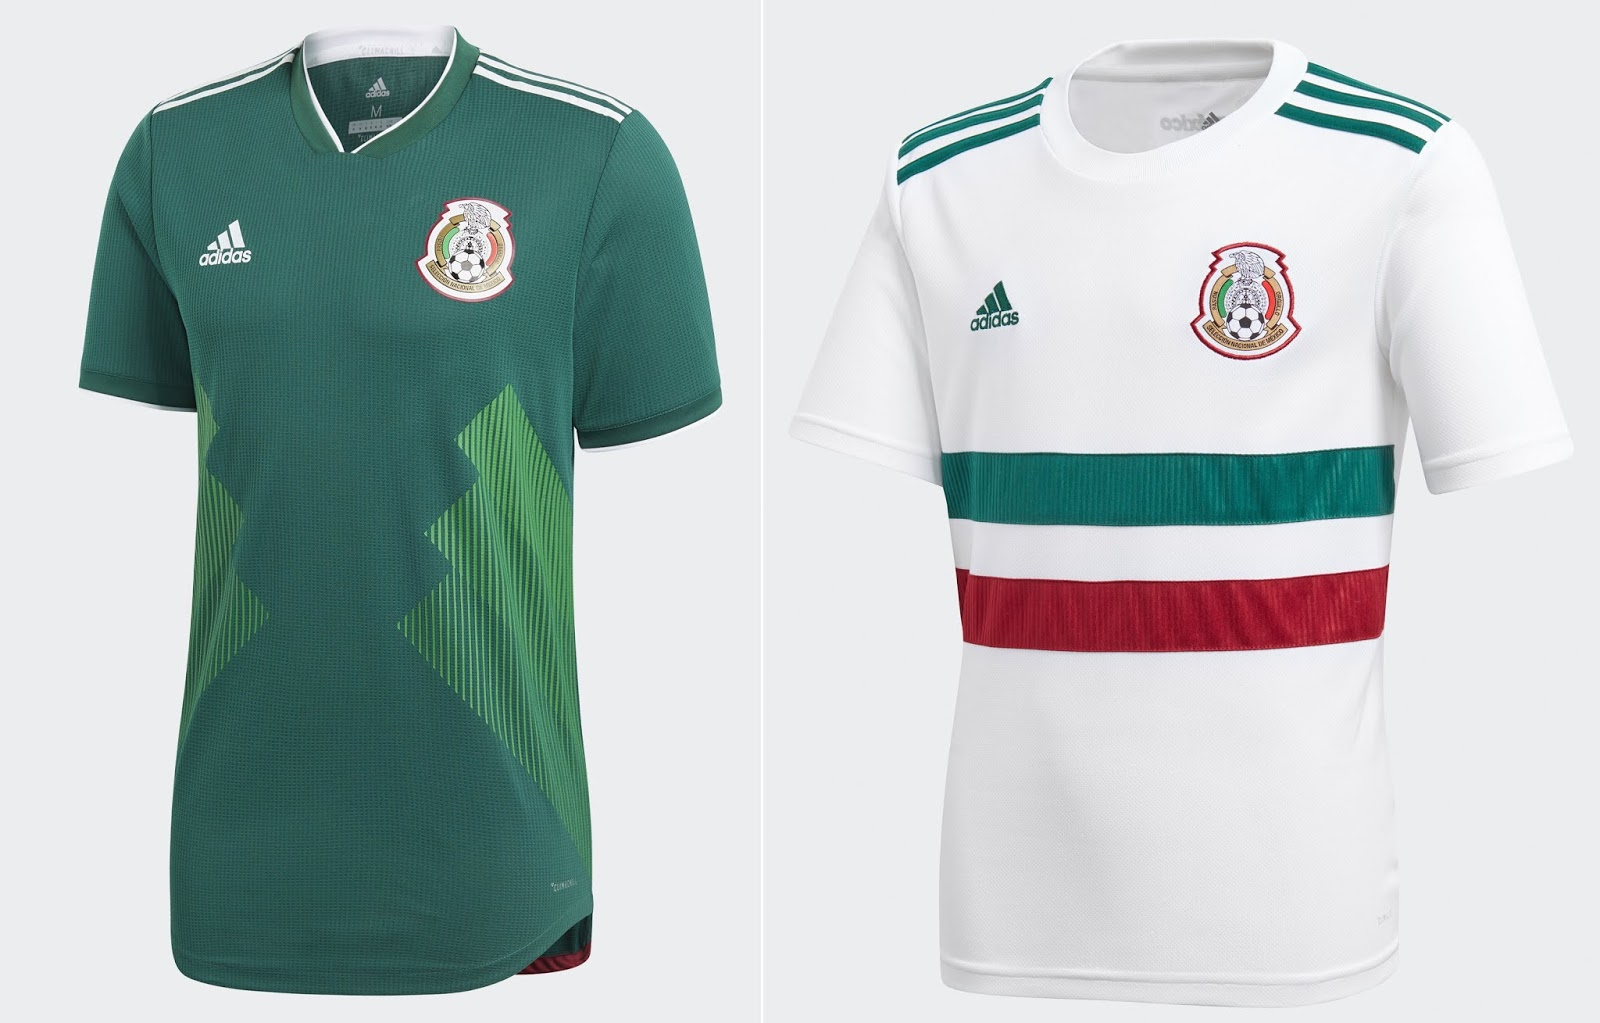 f94cb4b3b18 Mexico Team Jersey Near Me – Rockwall Auction